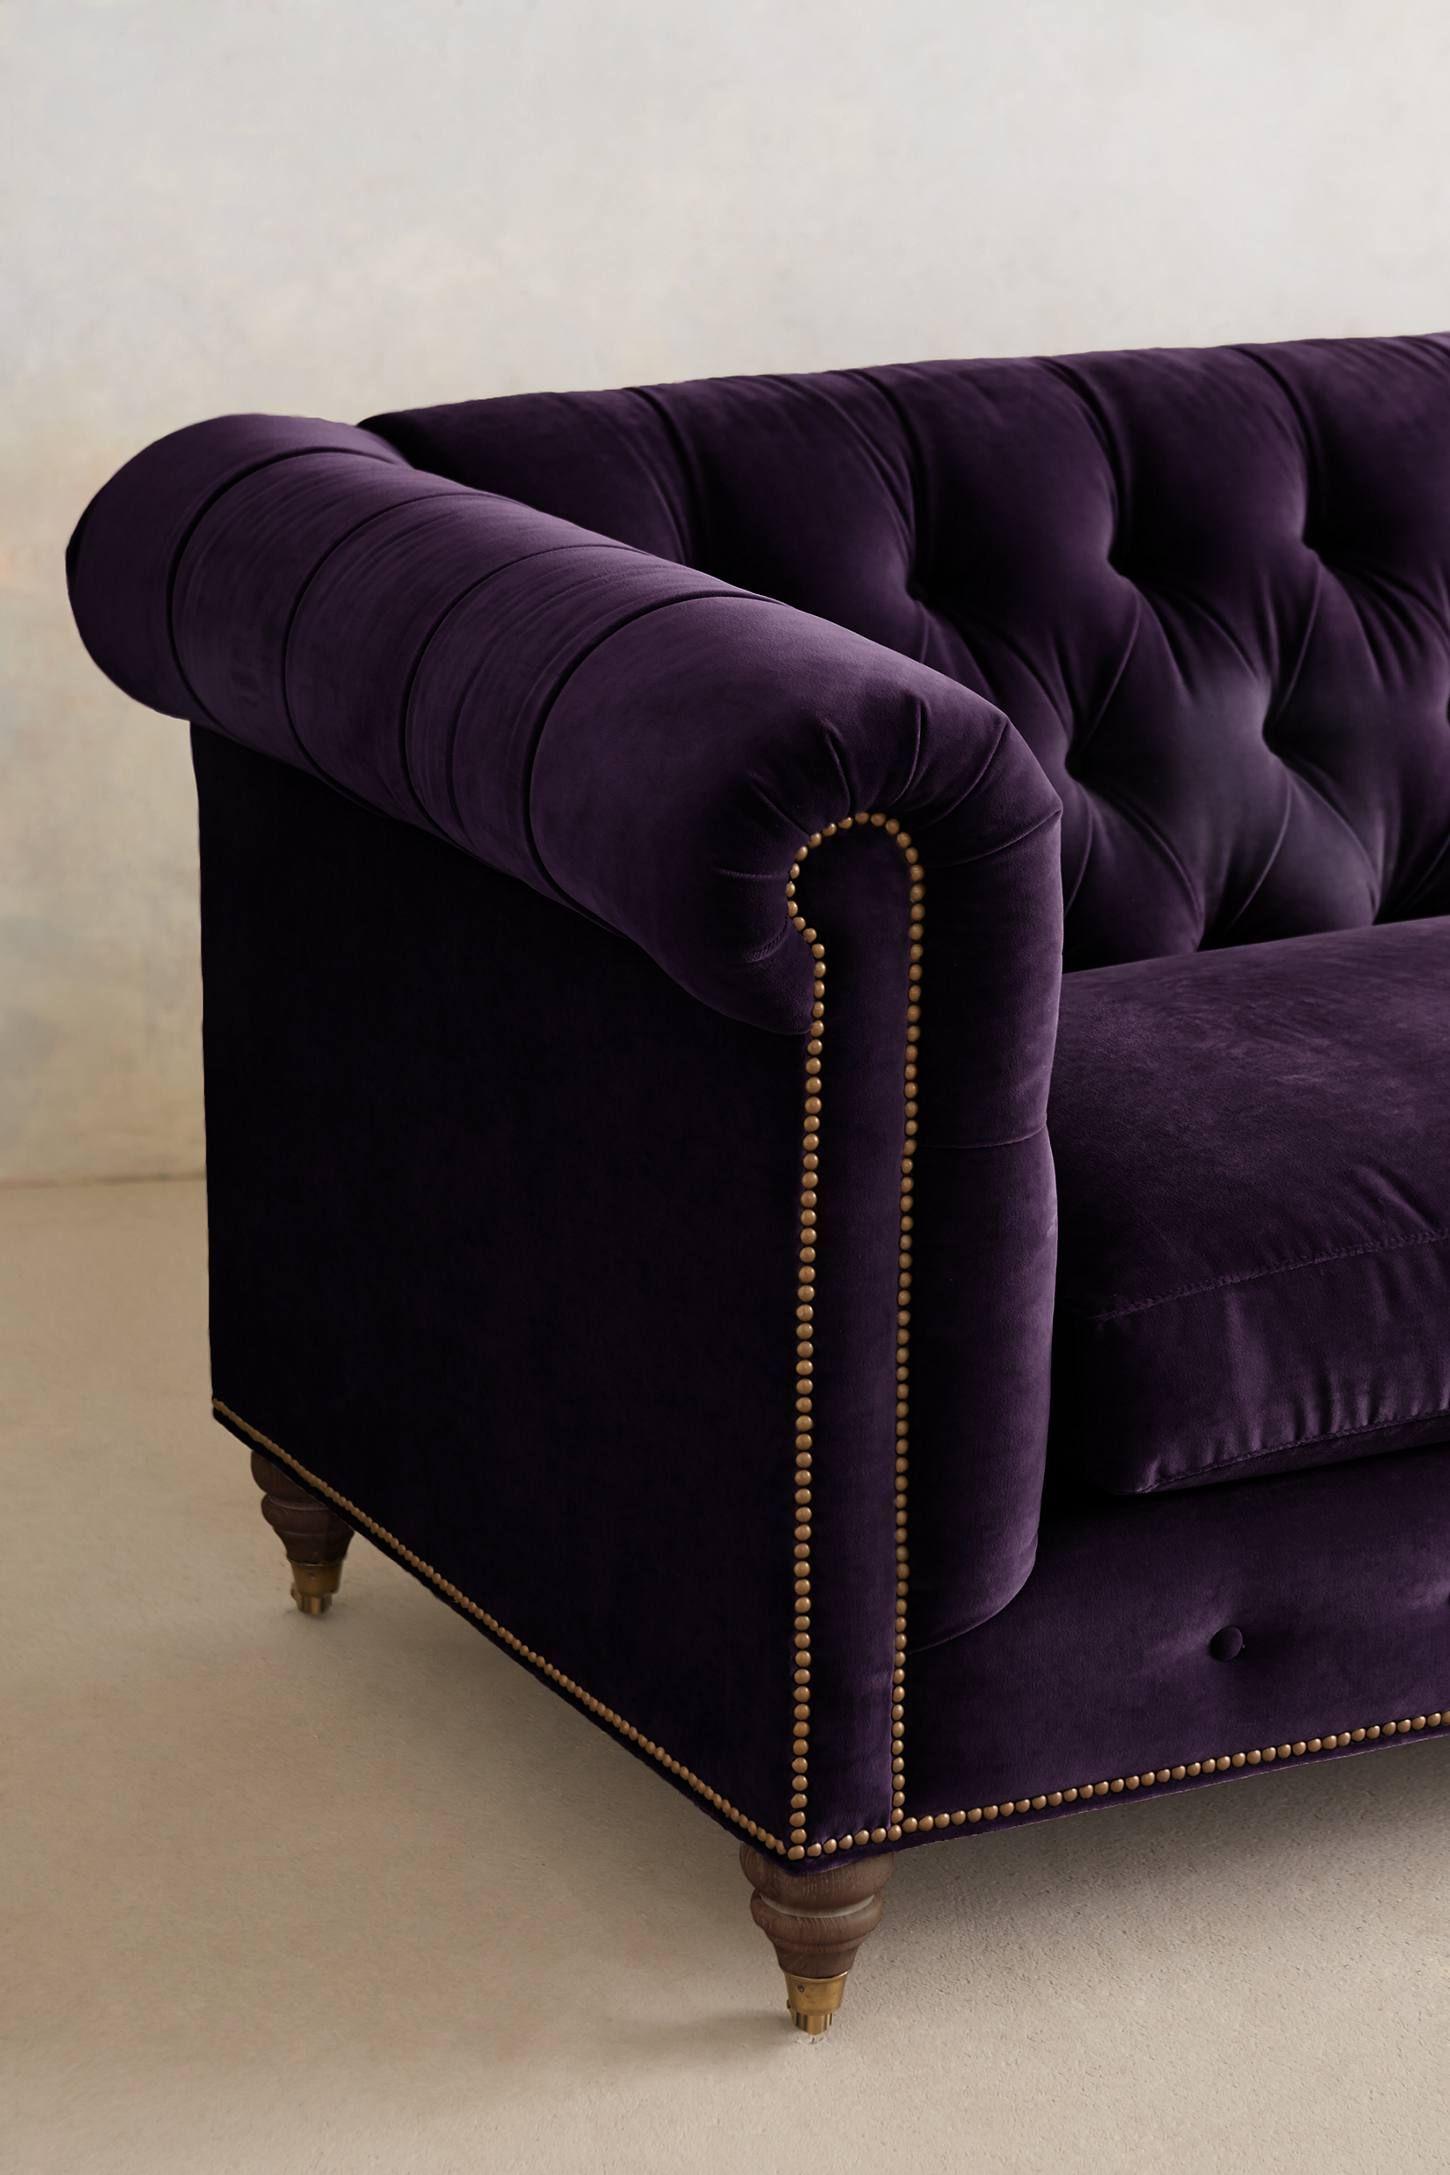 Velvet Lyre Chesterfield Sectional, Hickory Diseño de